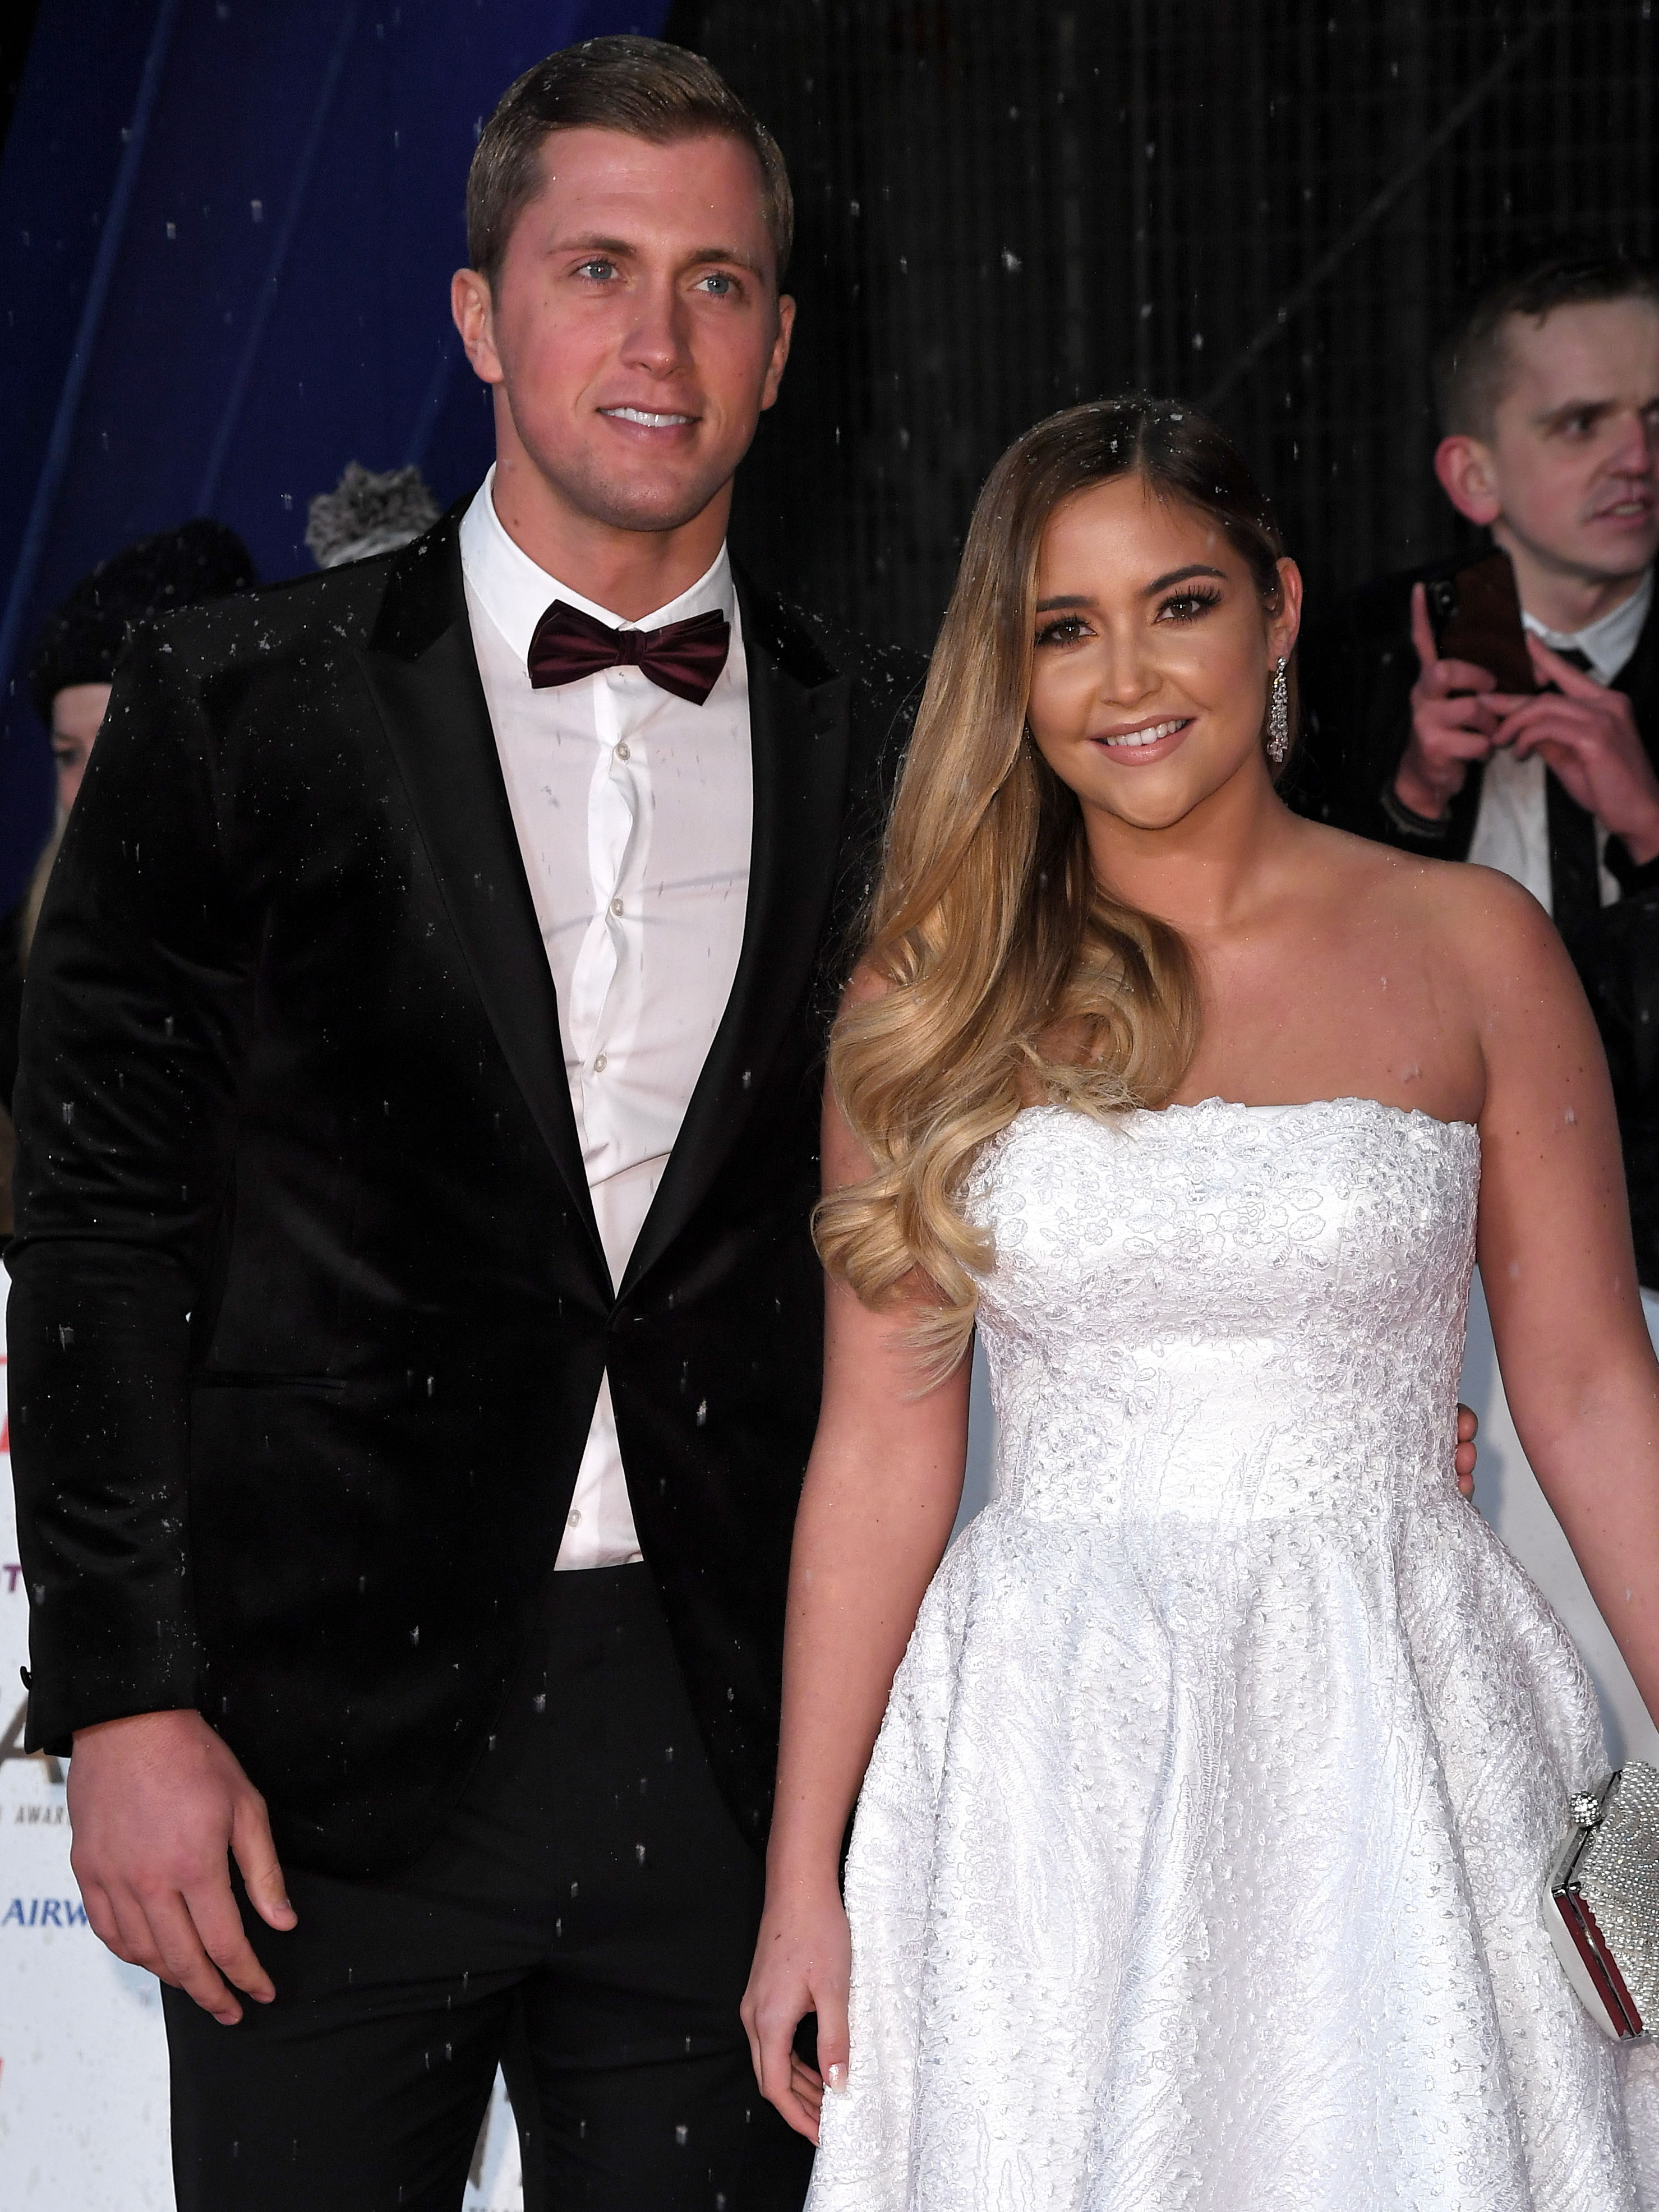 Dan Osborne and Jacqueline Jossa look totally in love on romantic Mykonos getaway after marriage drama